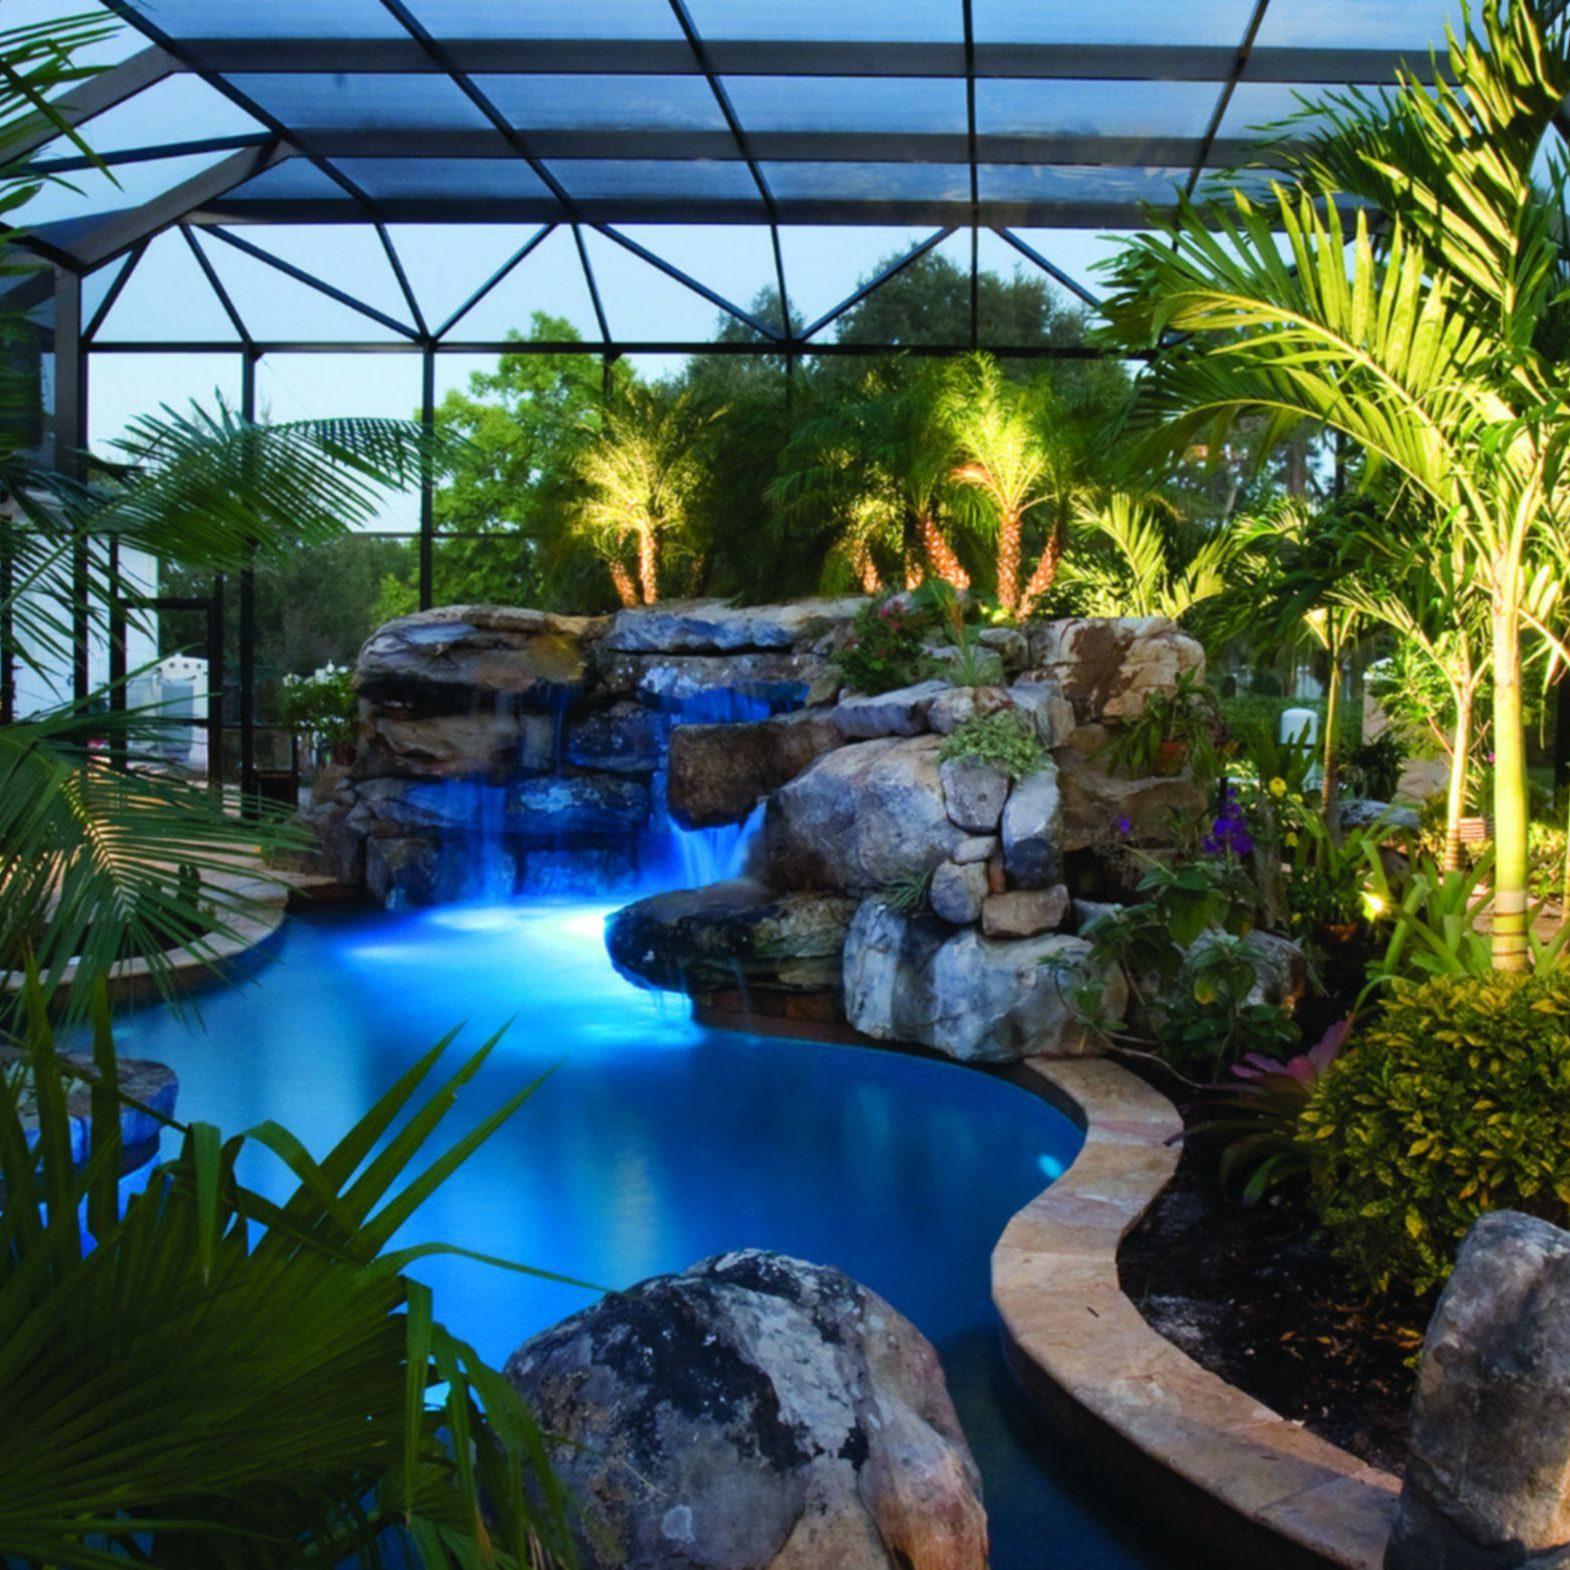 naples garden landscaping poolside garden